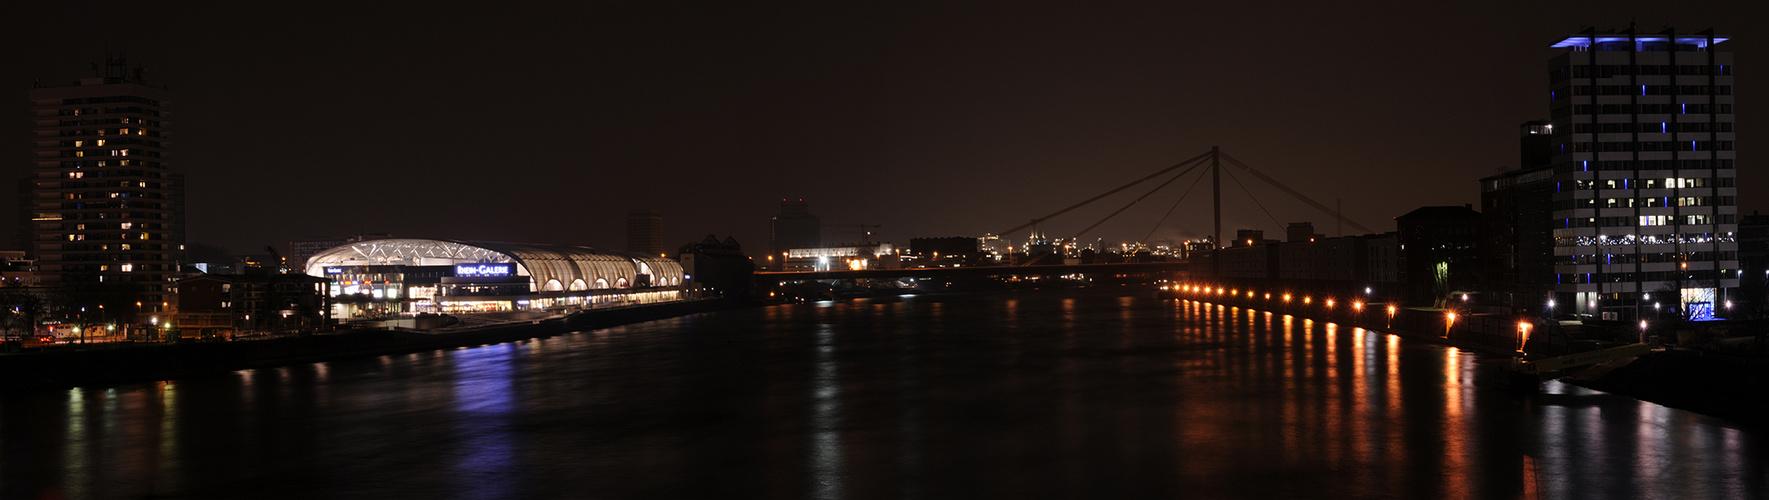 Ludwigshafen bei Nacht (I)